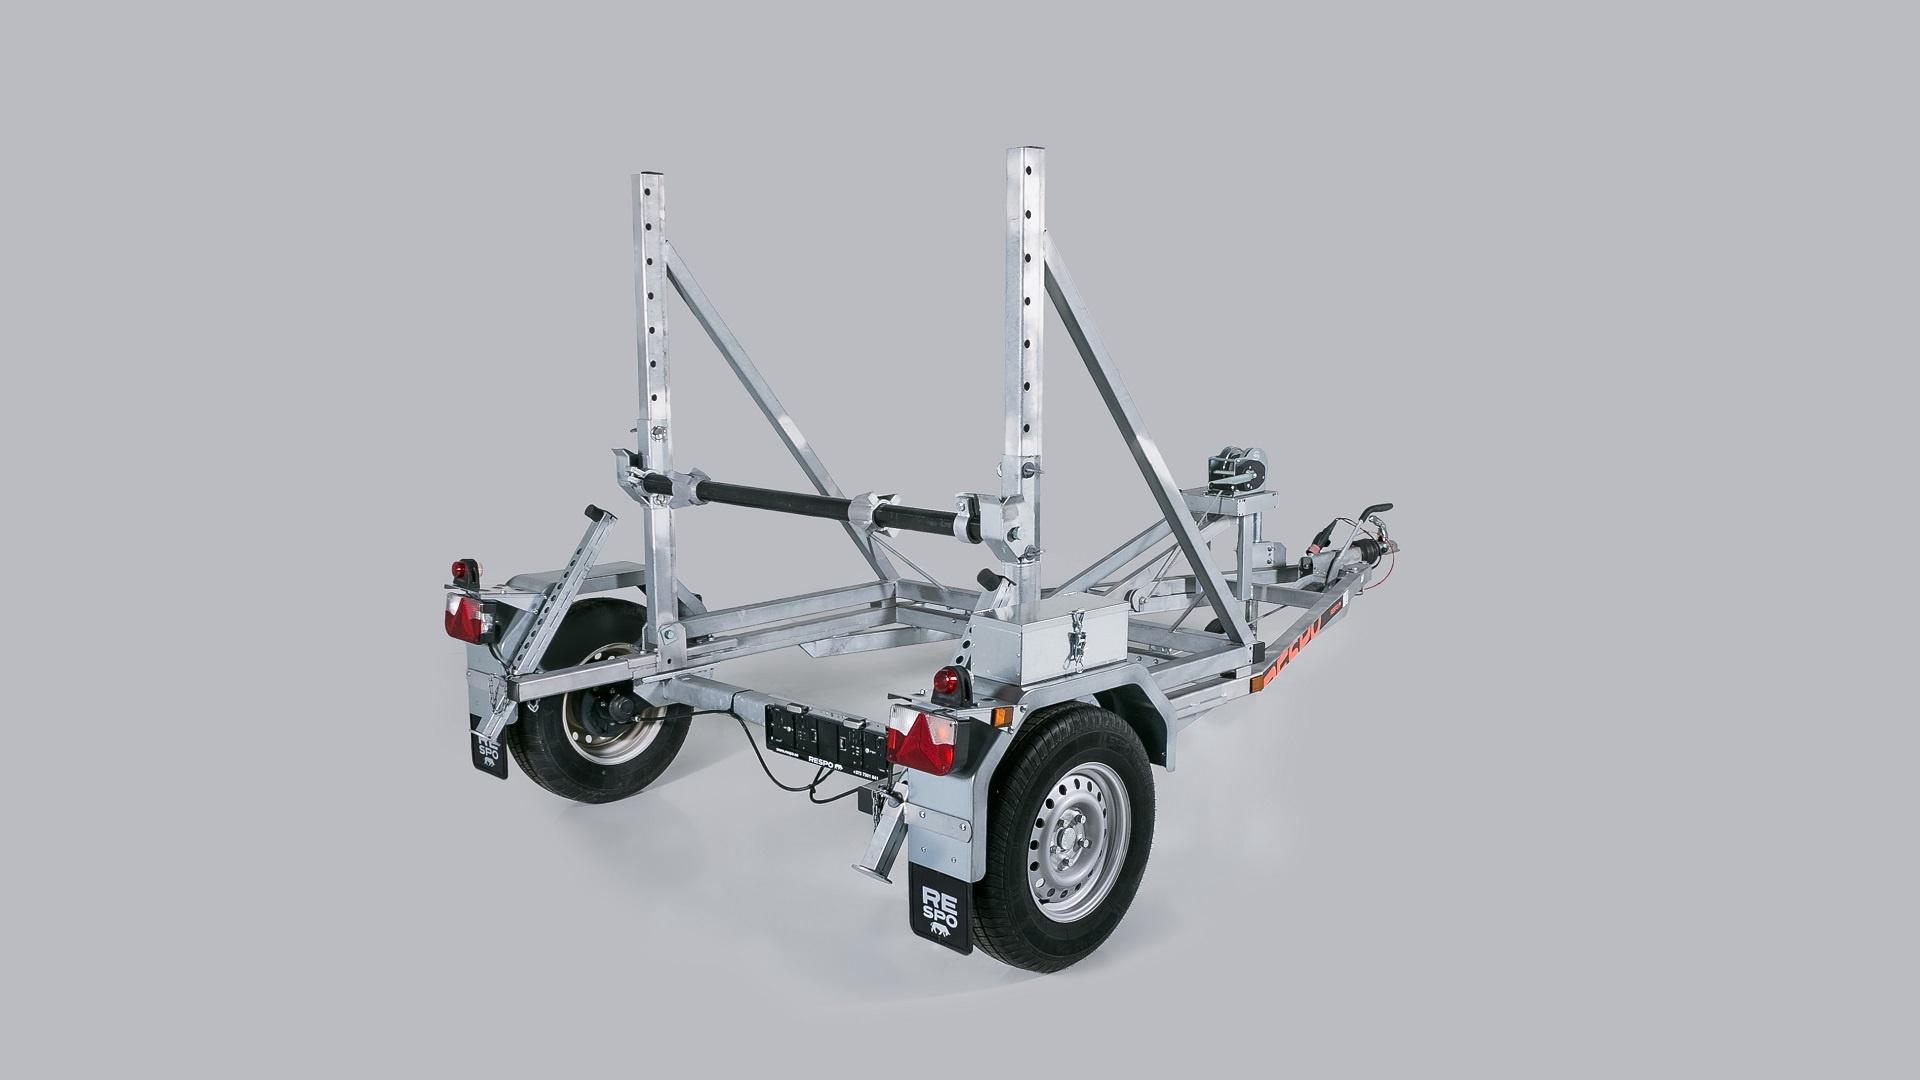 https://0201.nccdn.net/1_2/000/000/0de/40f/1500S441T210-Cable-drum-trailer_02-1920x1080.jpg